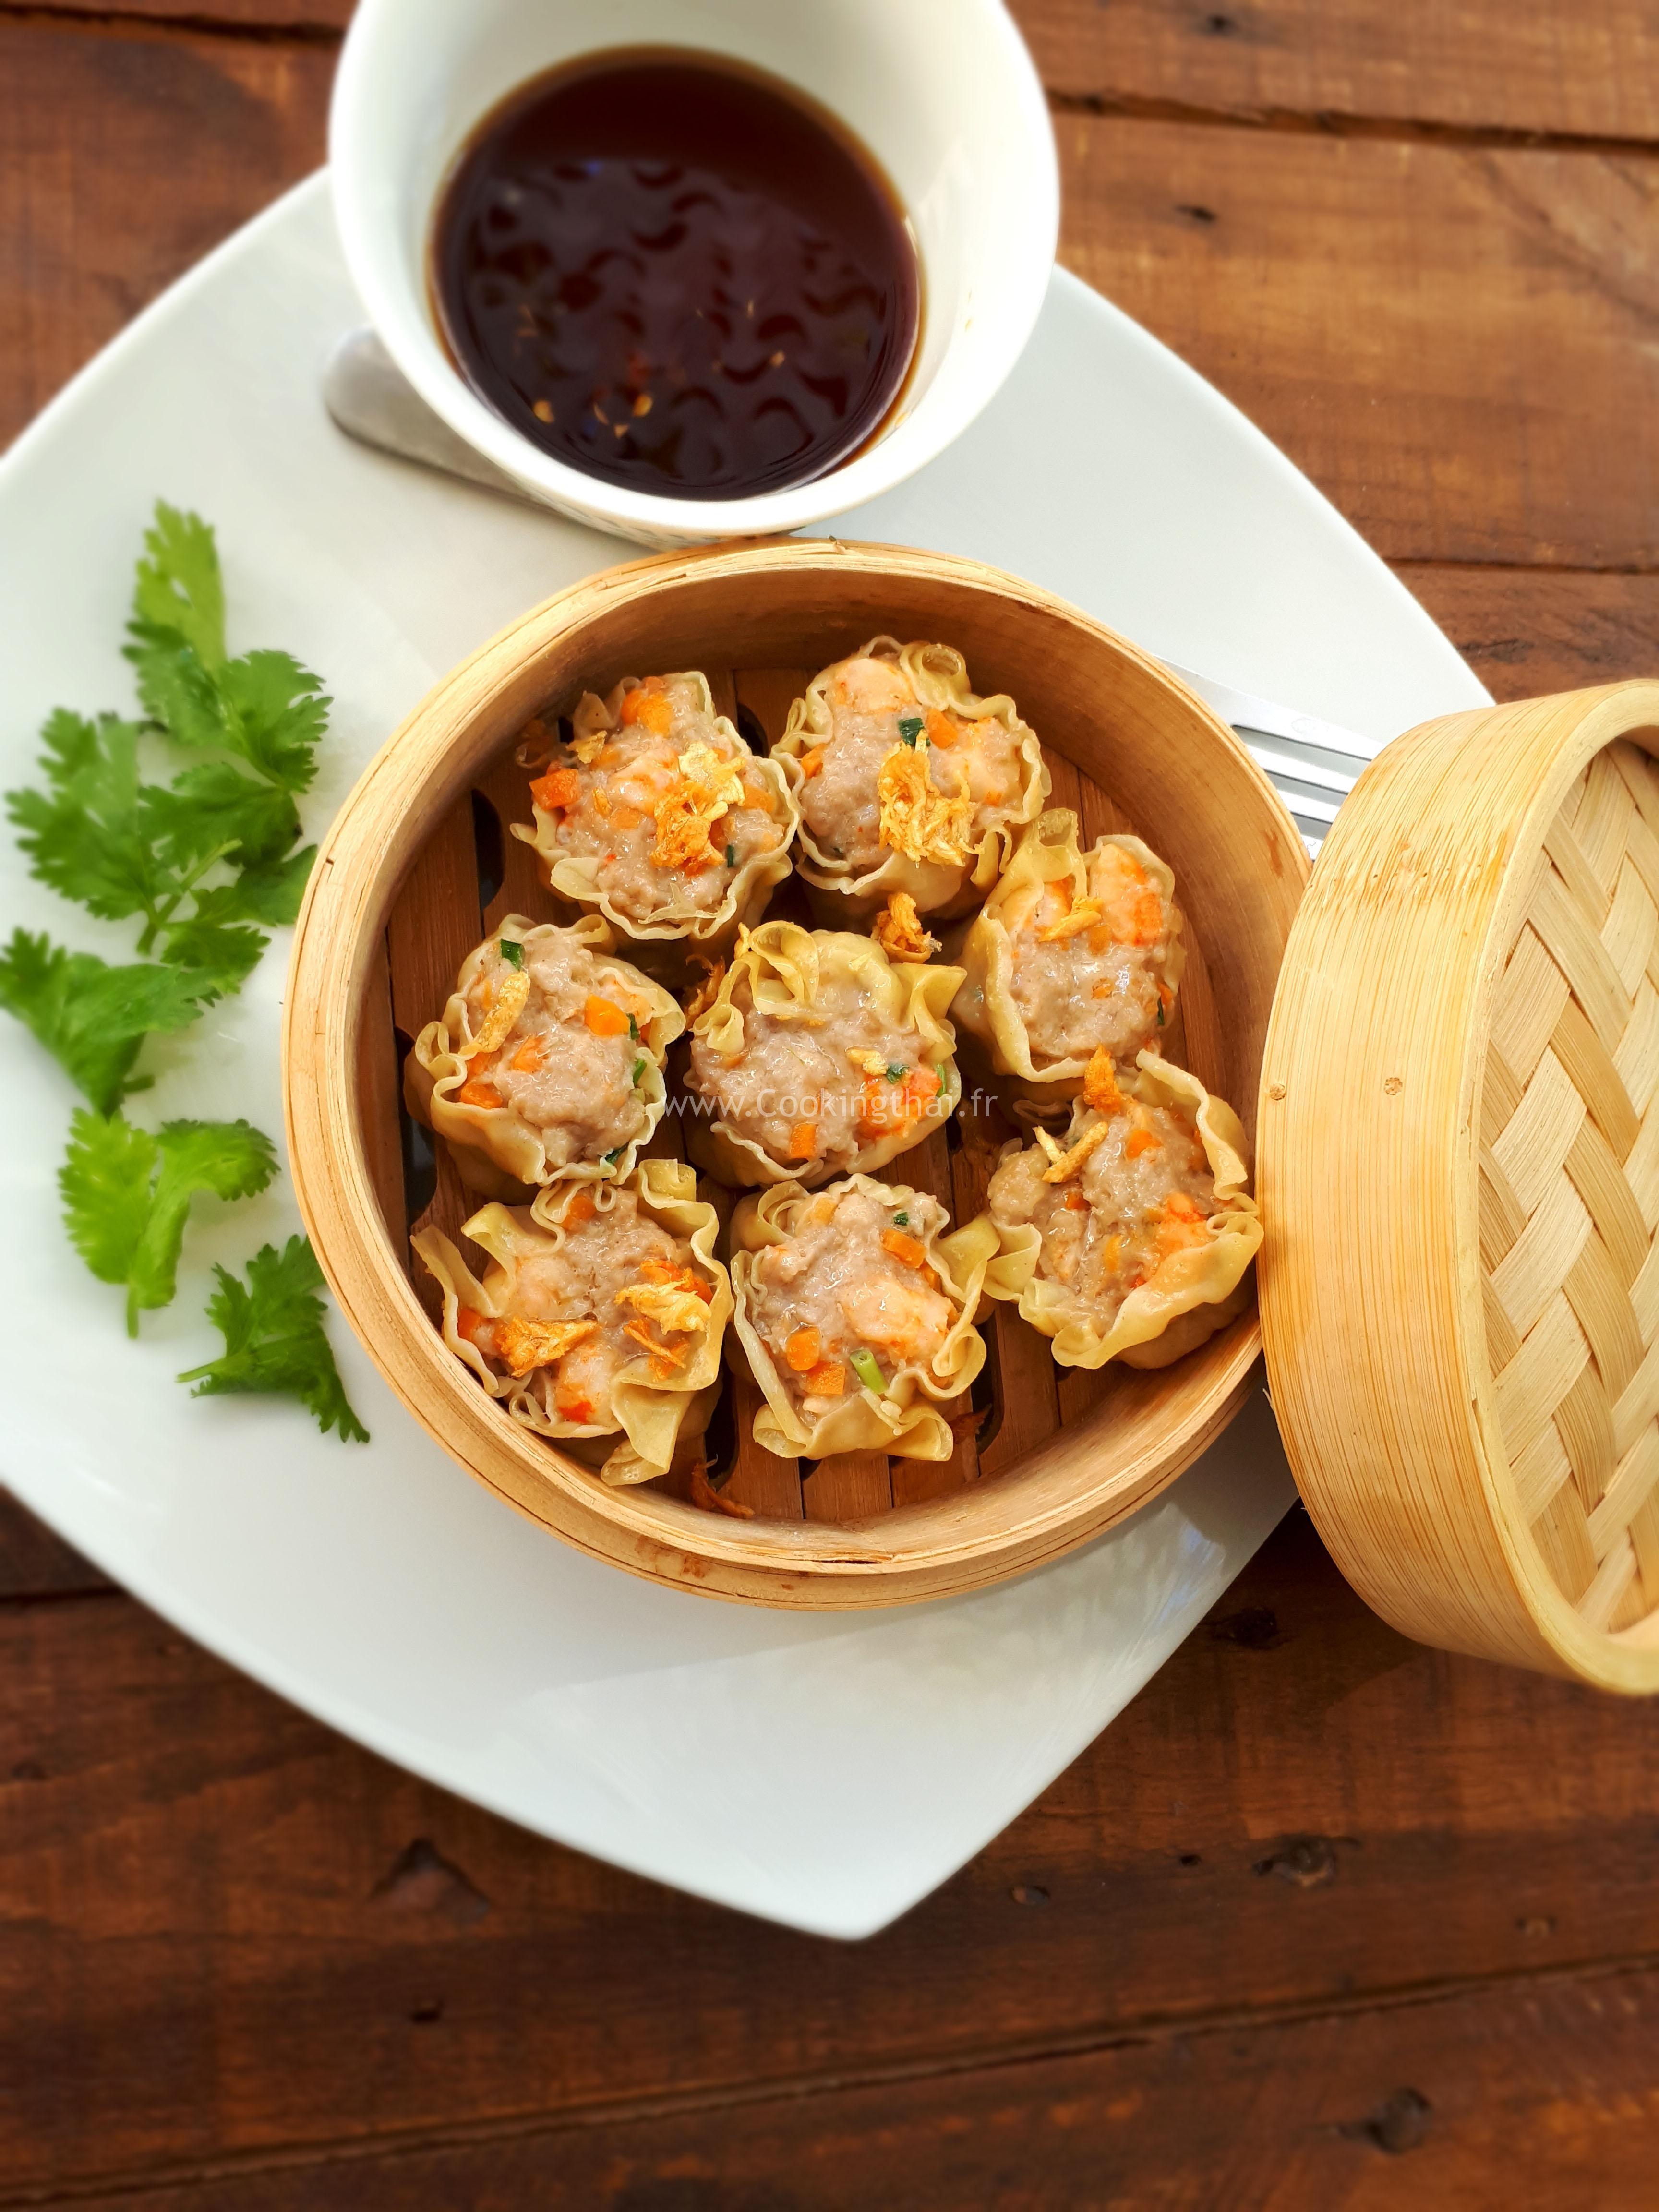 Raviolis de porc/crevette et sauce soja